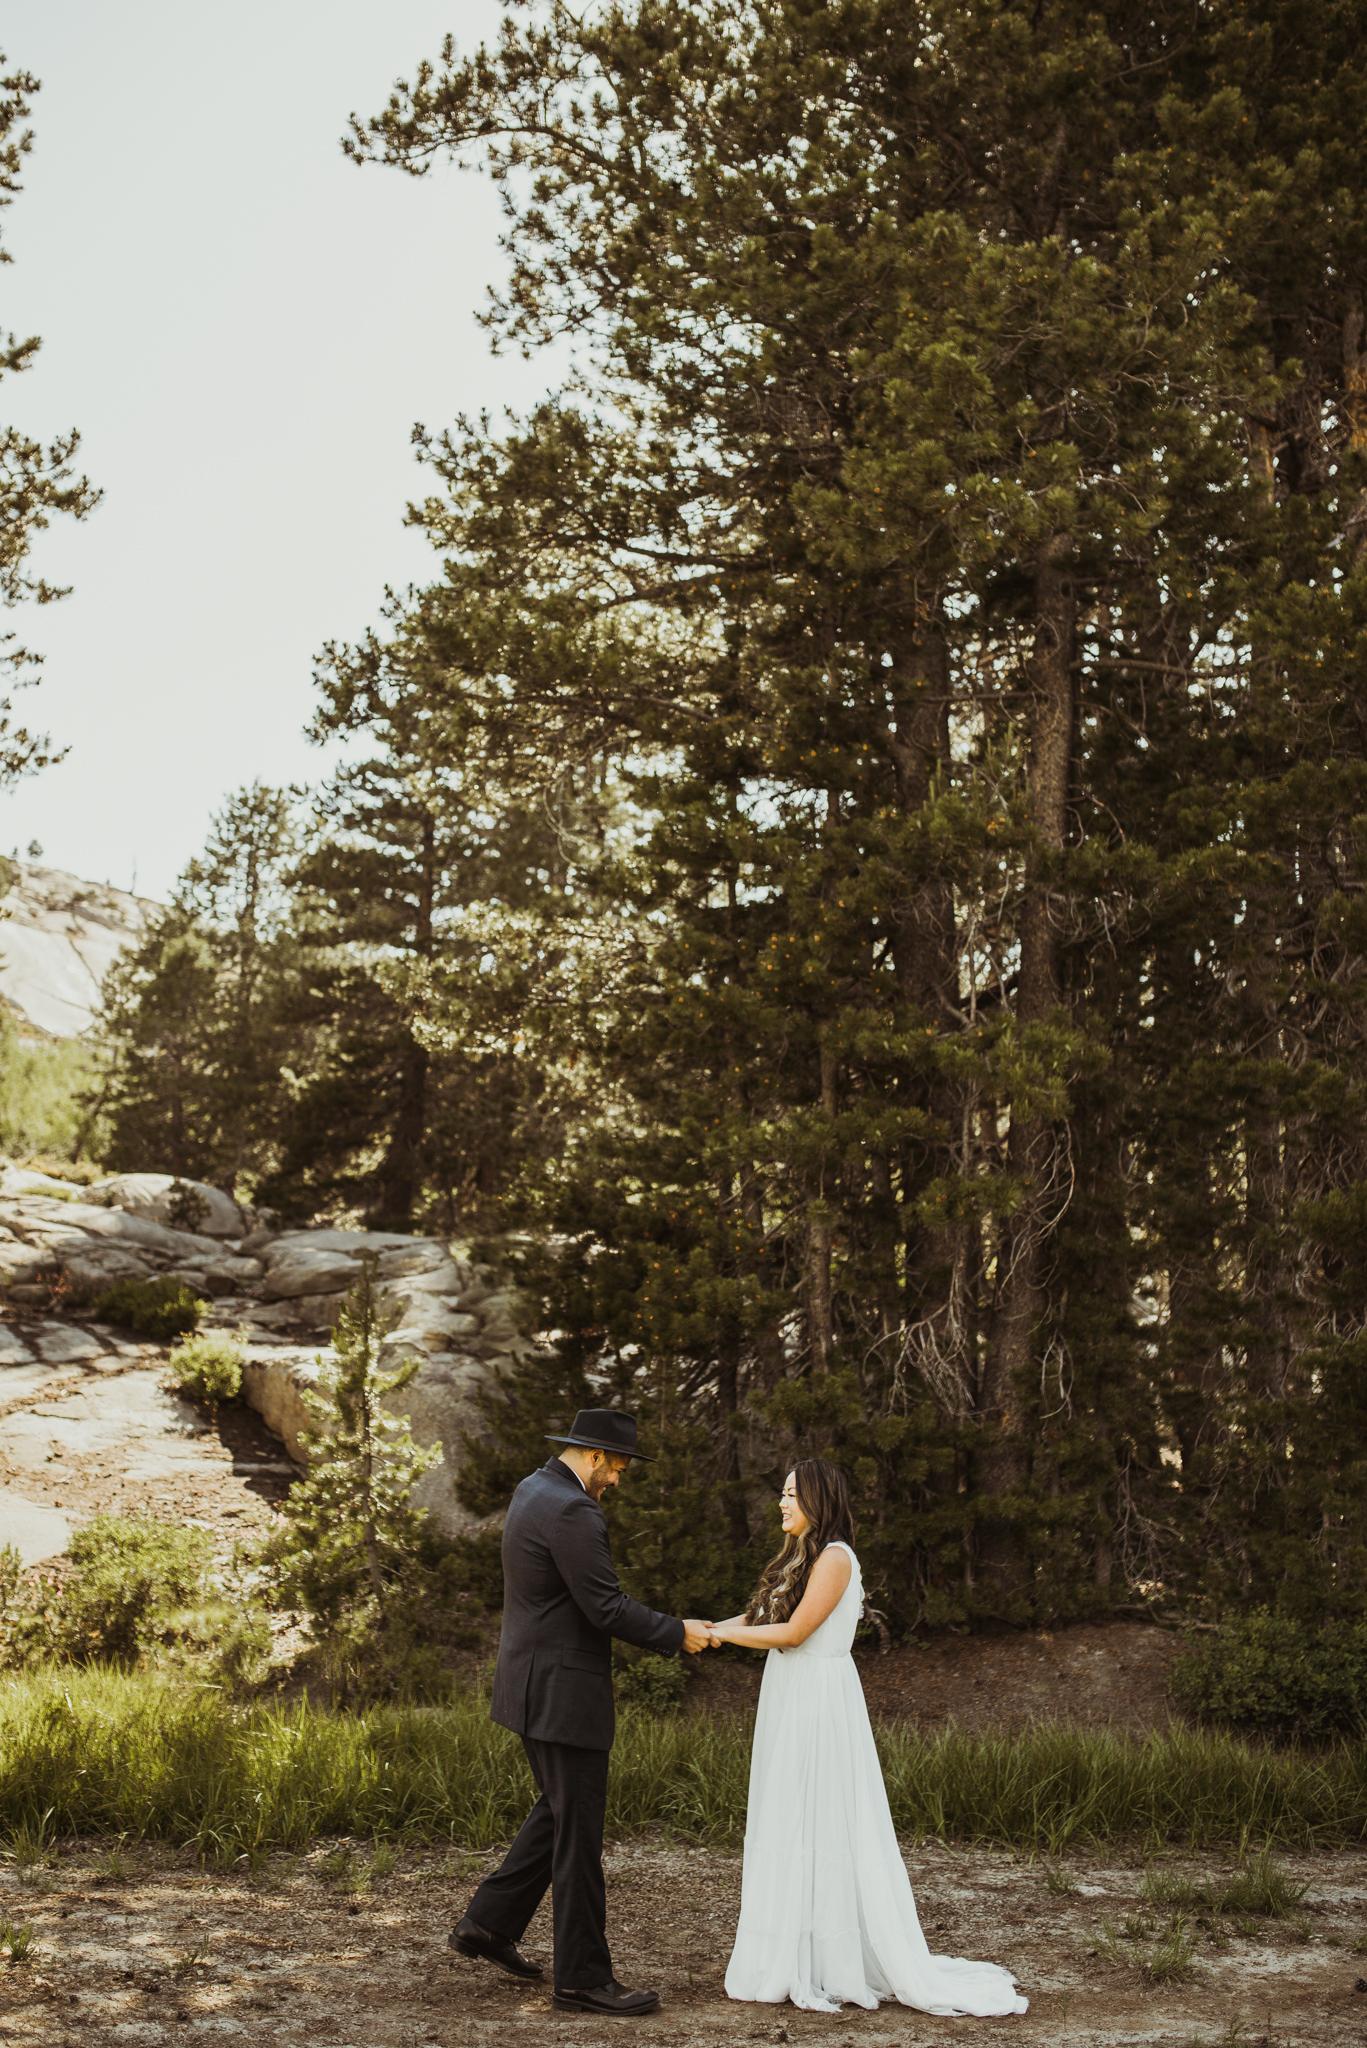 ©Isaiah & Taylor Photography -The Hideout Wedding, Kirkwood California, Lake Tahoe Wedding Photographer-73.jpg